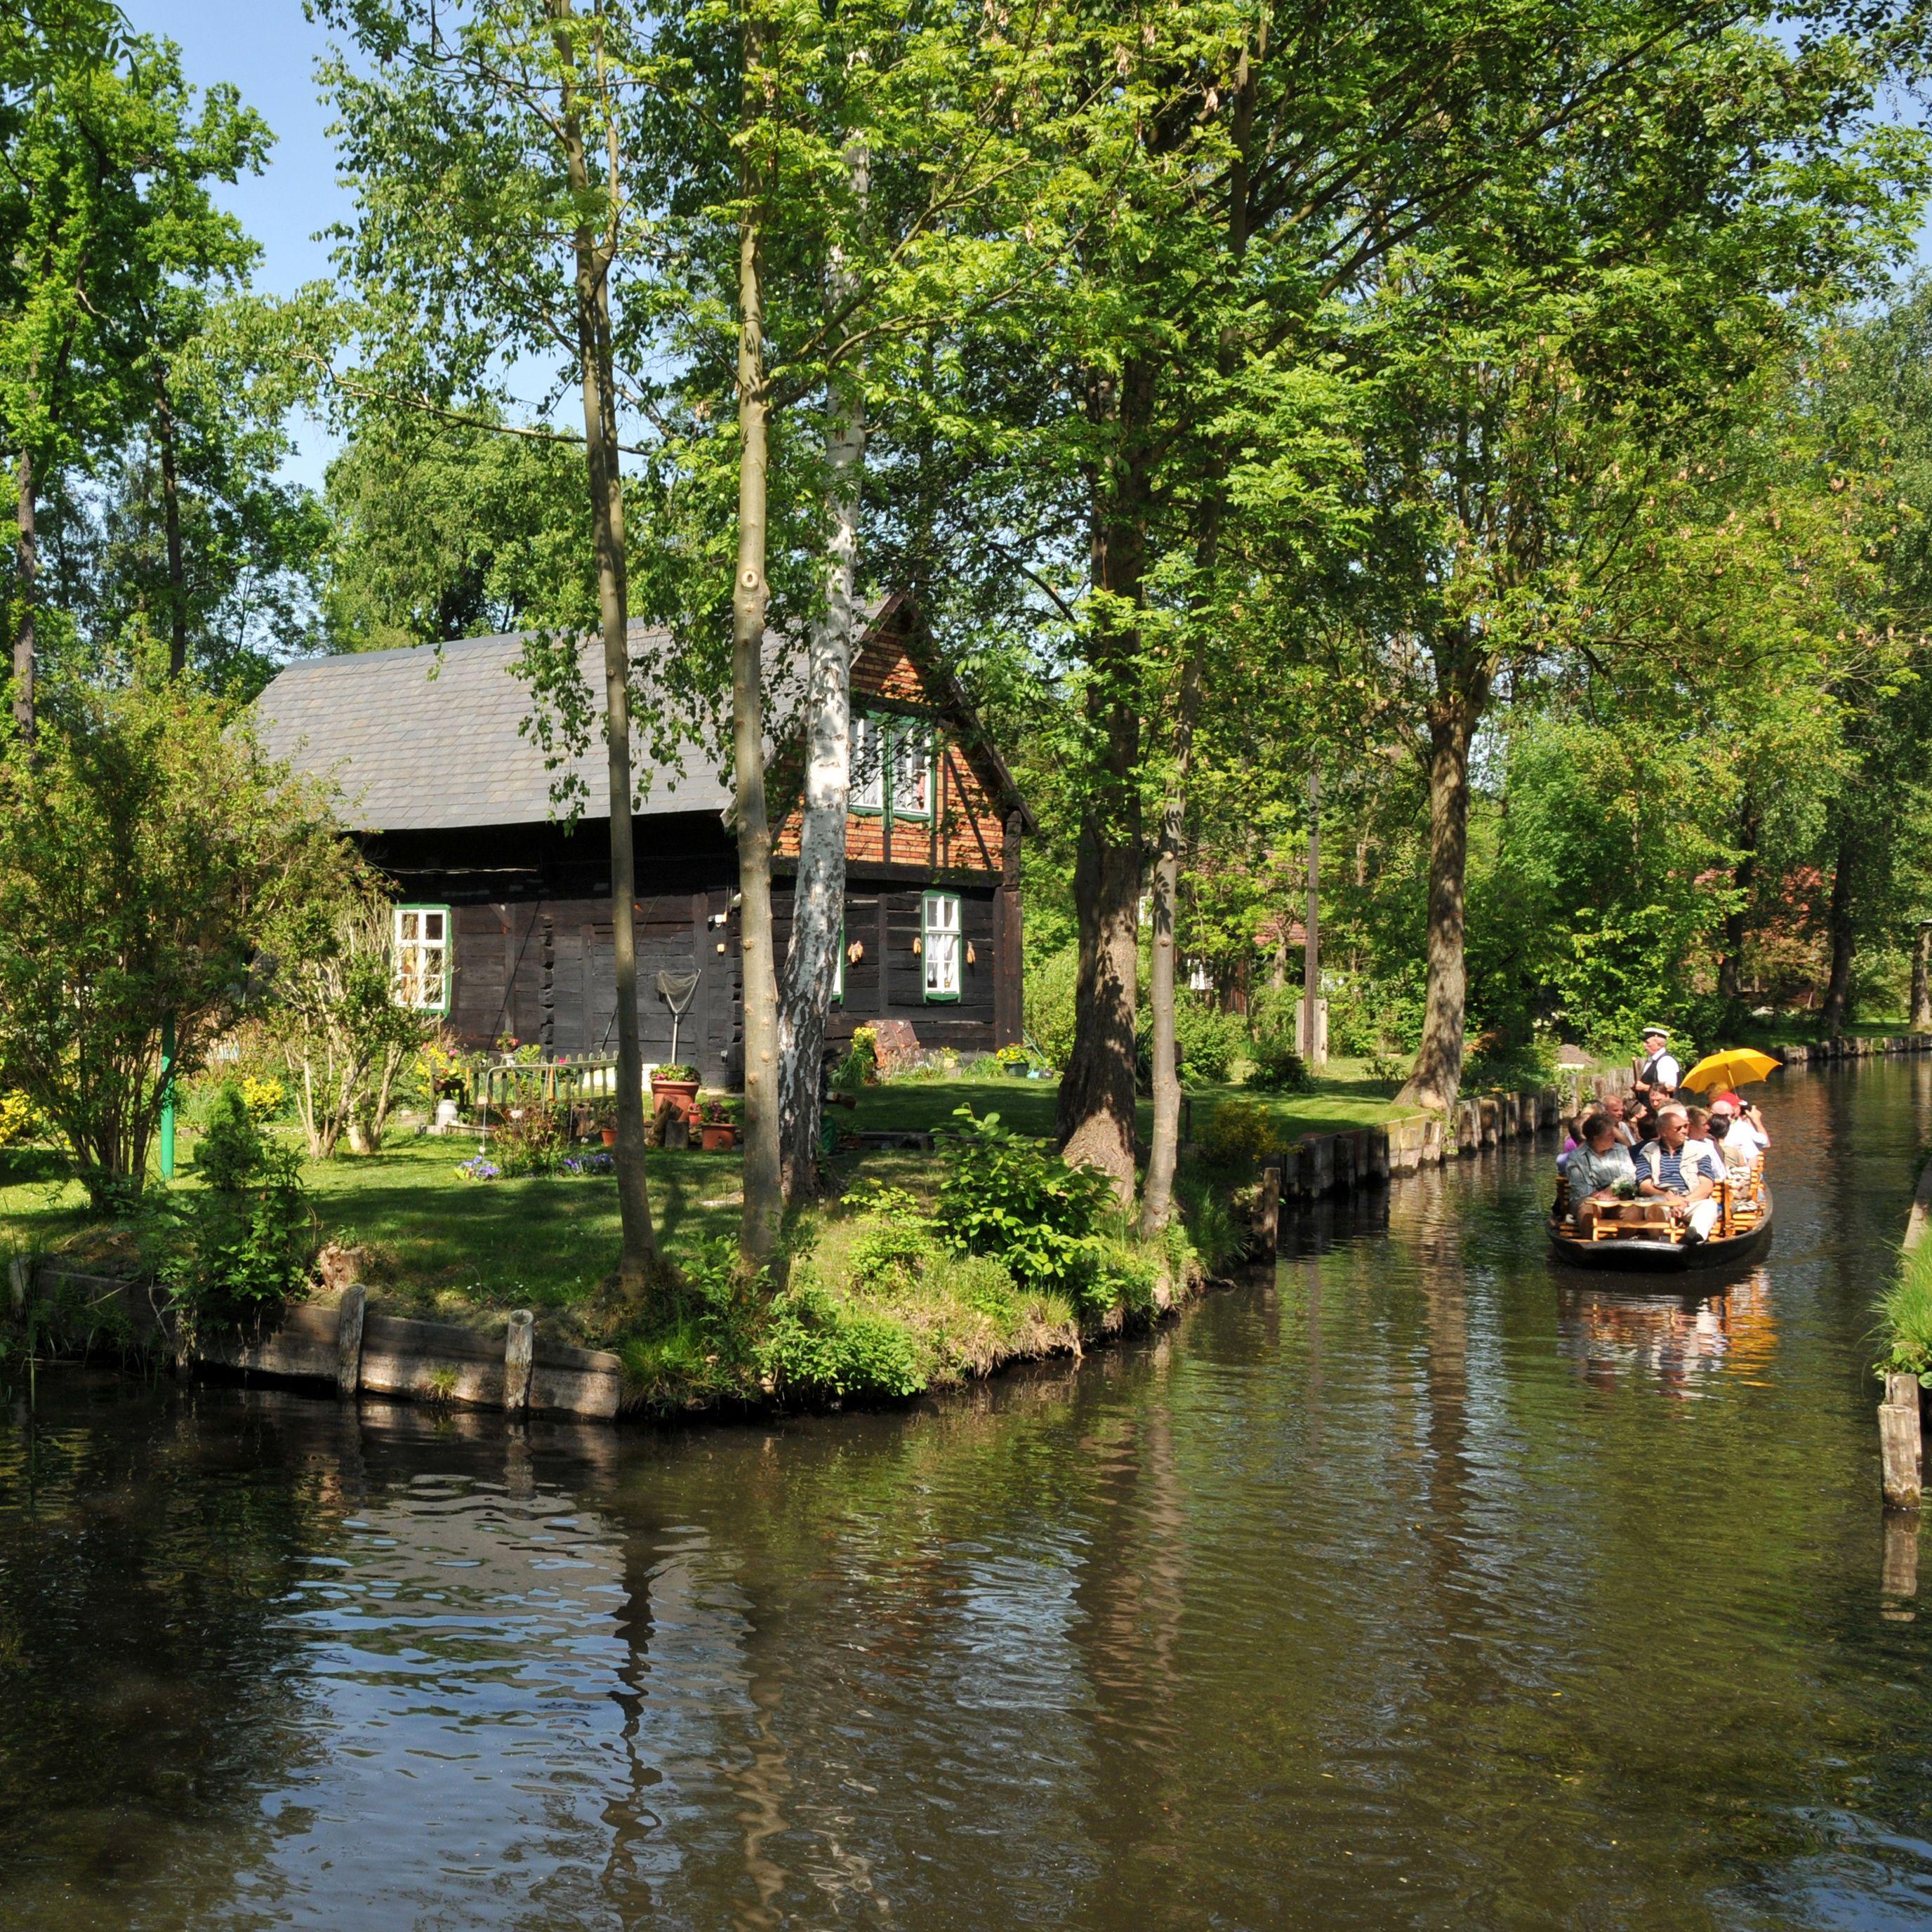 Kurzurlaub im Spreewald Urlaub, Kurzurlaub und Reisen